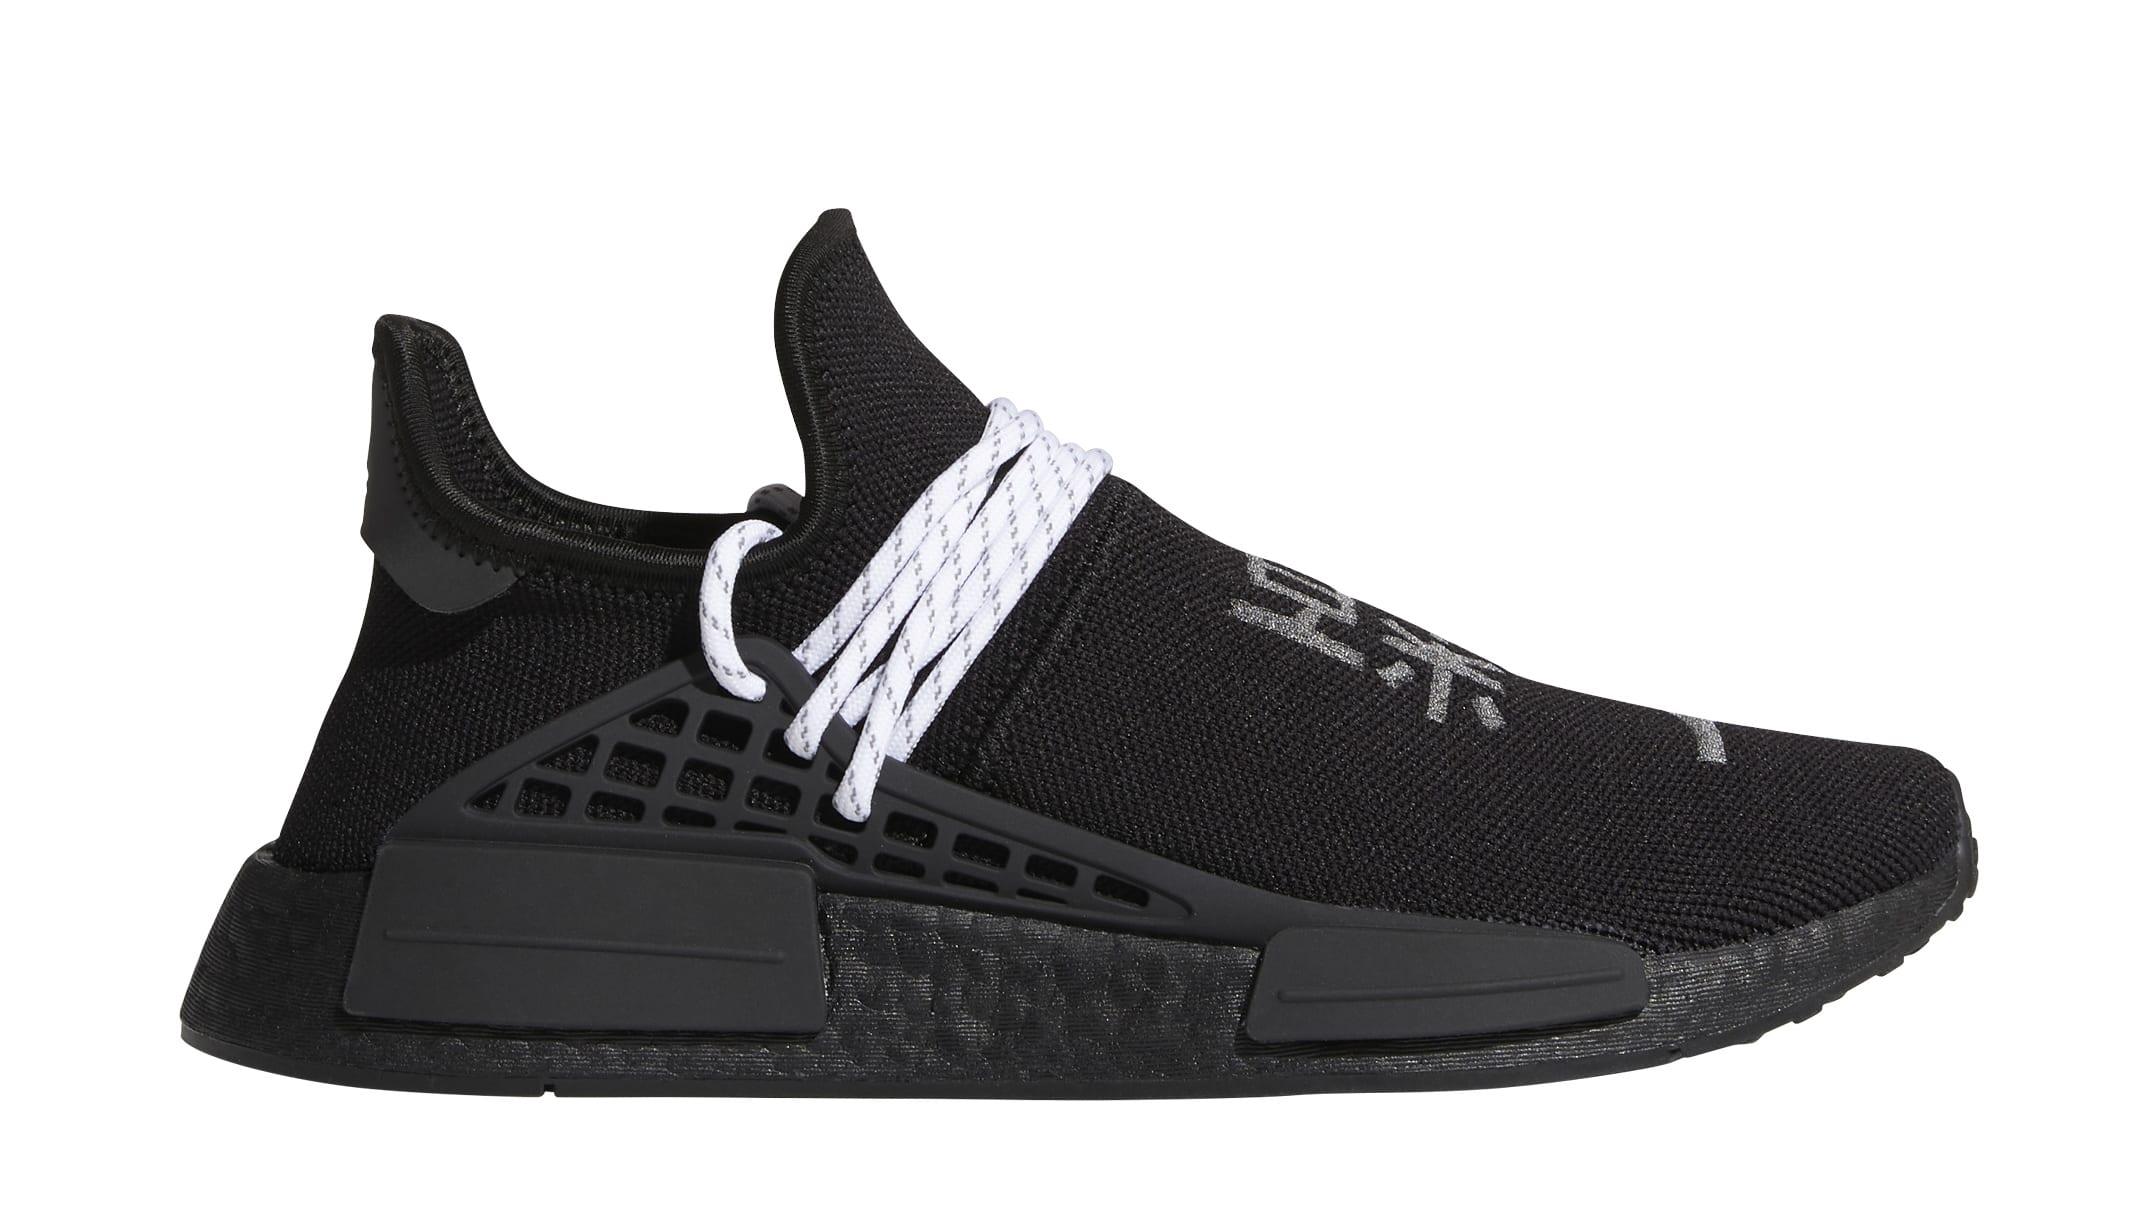 Pharrell Williams x Adidas NMD Hu 'Black' 2020 GY0093 (Lateral)